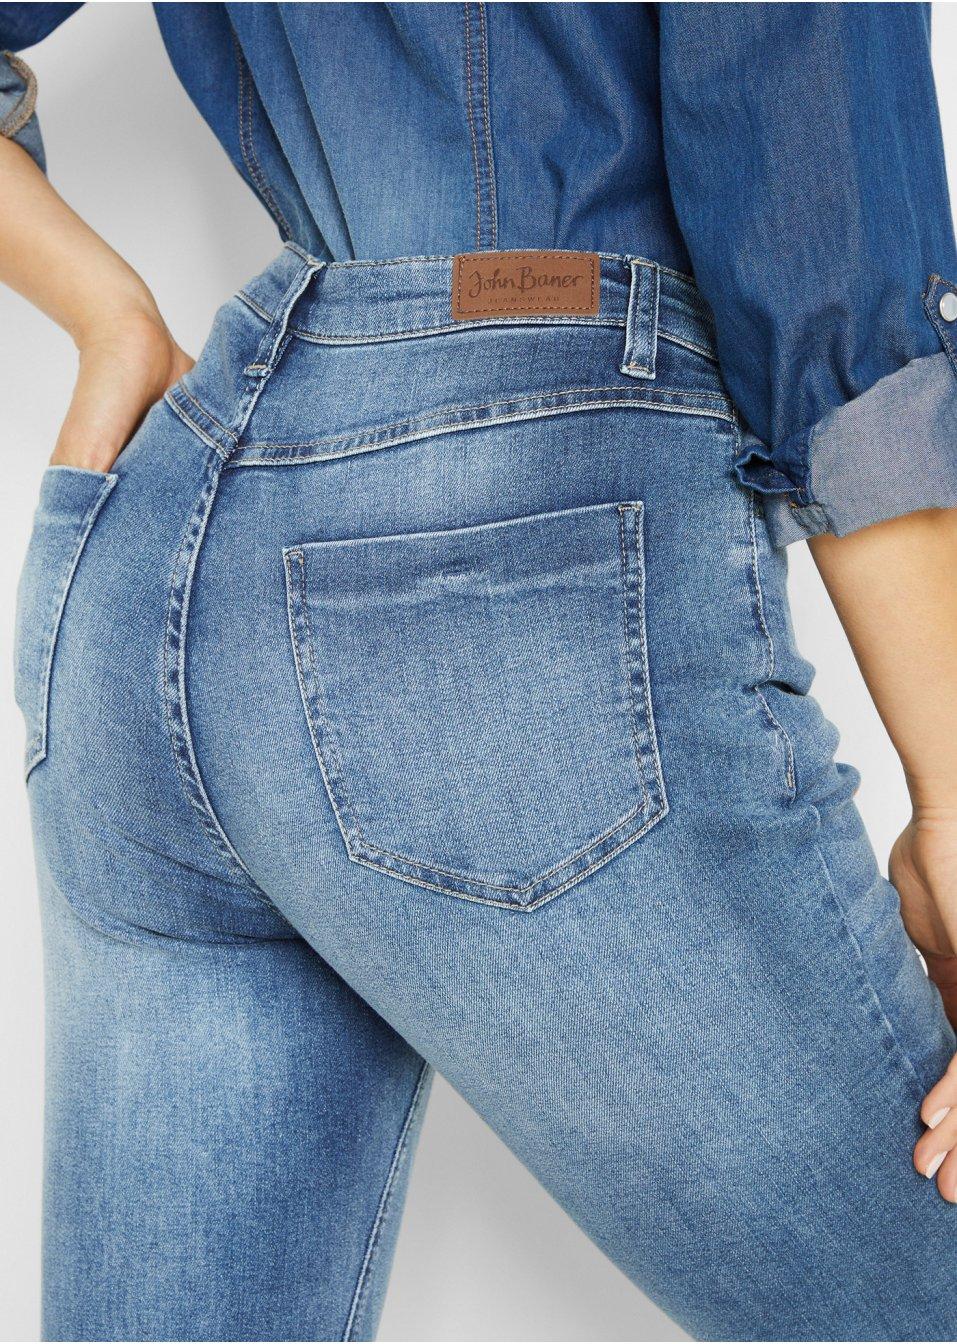 Mode Femme Vêtements DJLfdOFlkj Jean Boyfriend bleu John Baner JEANSWEAR acheter online .fr